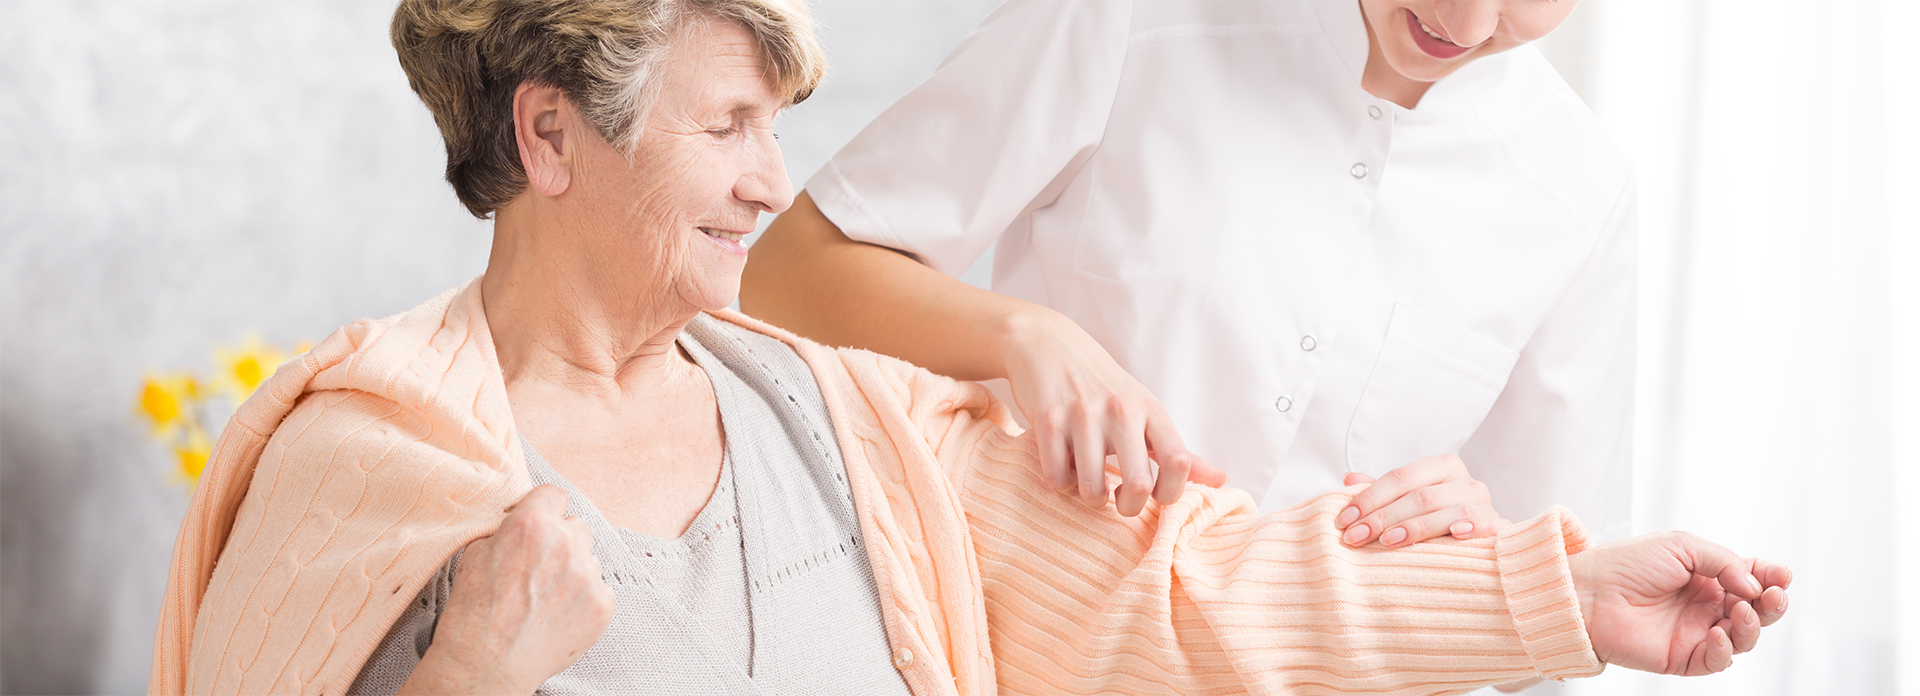 young-nurse-helping-elderly-woman-PAWNESZ